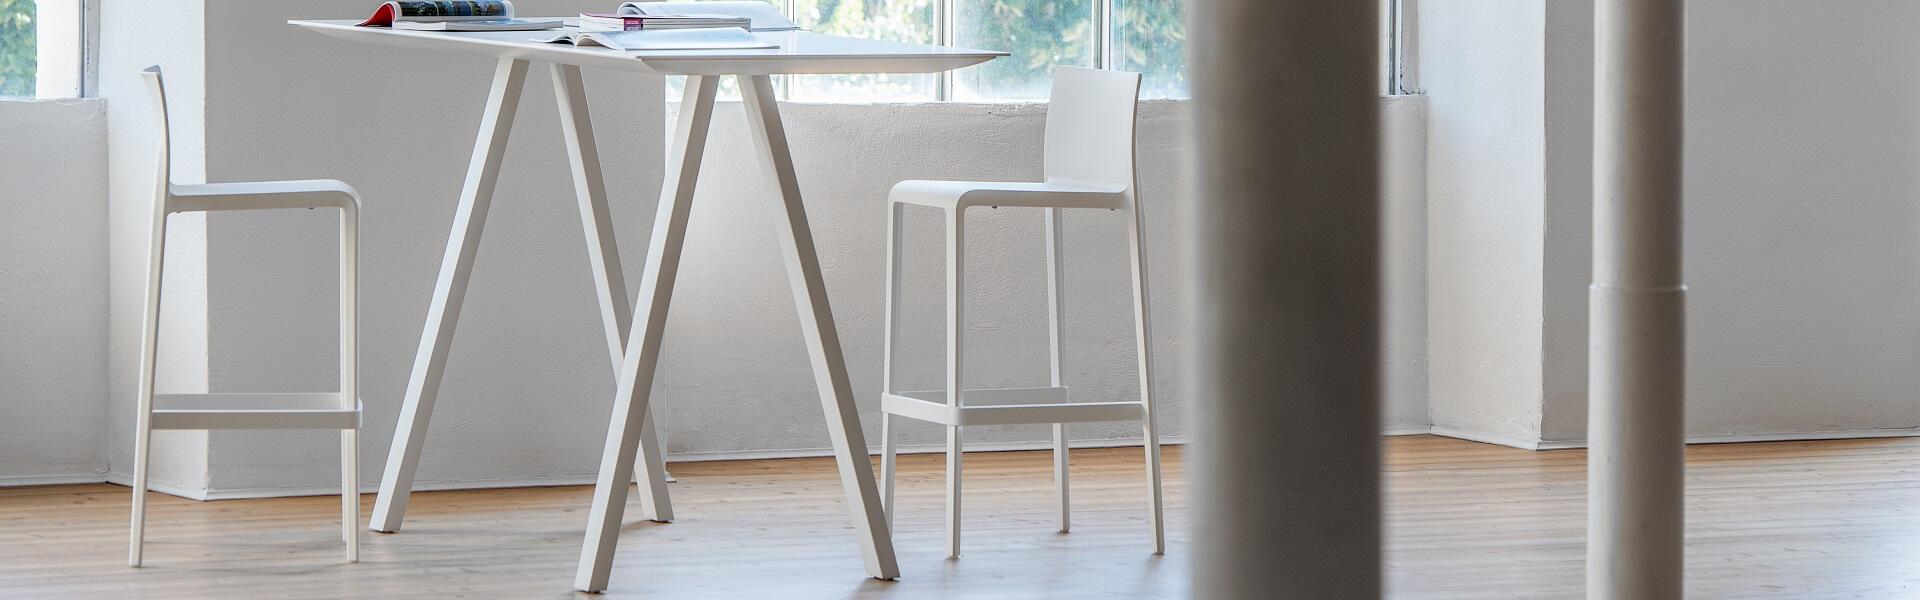 moderne vergaderkamer inrichting | van de wetering | werkplekregisseur